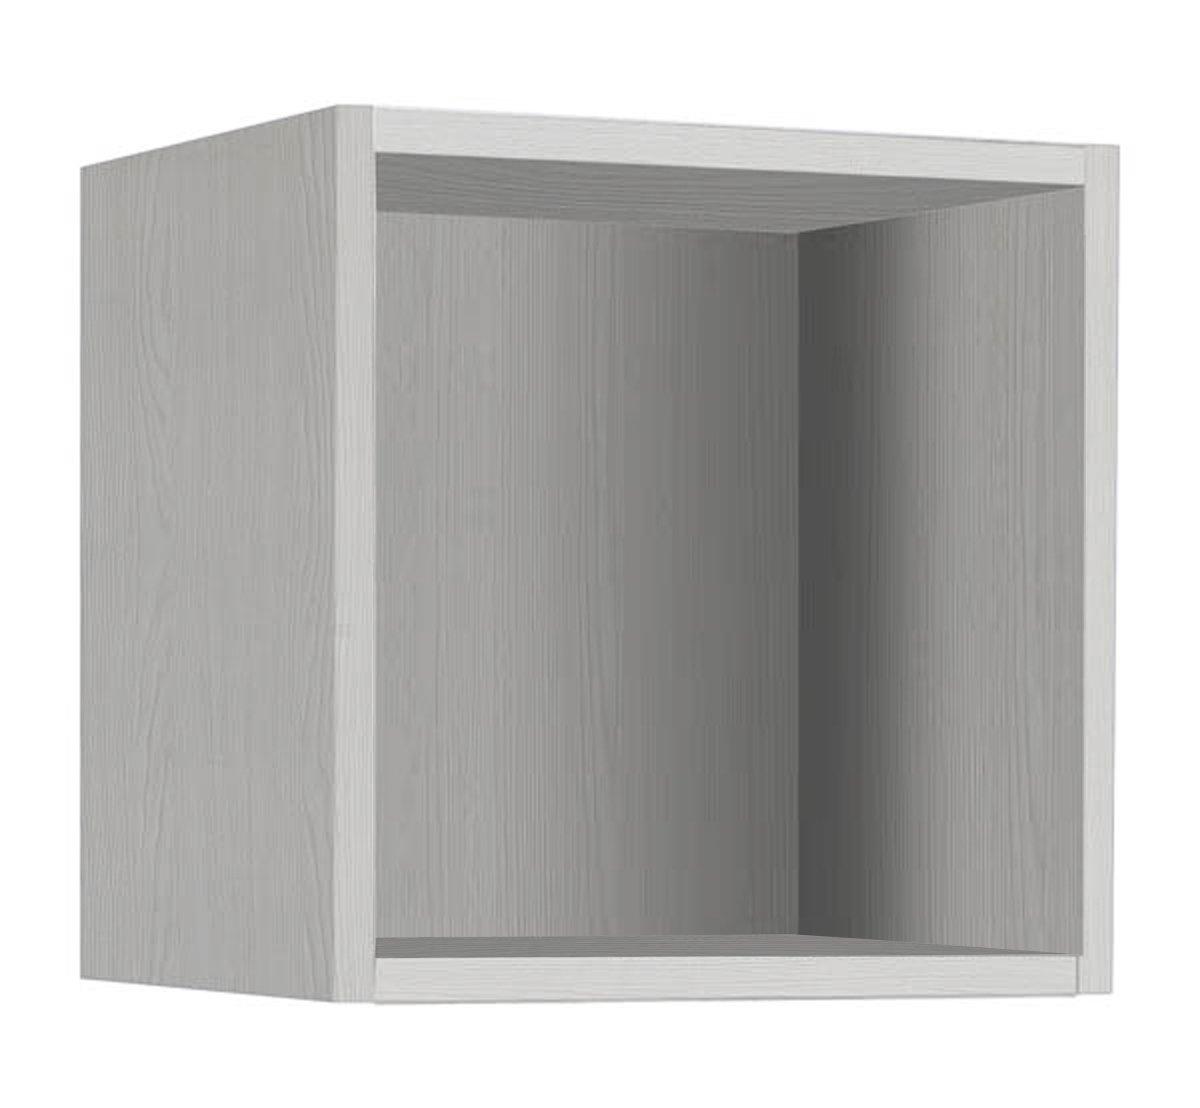 Giessegi Job 9339, Libreria Verticale Appesa a Muro, Legno, Cielo, 316 x 40 x 40 cm it home GIET55